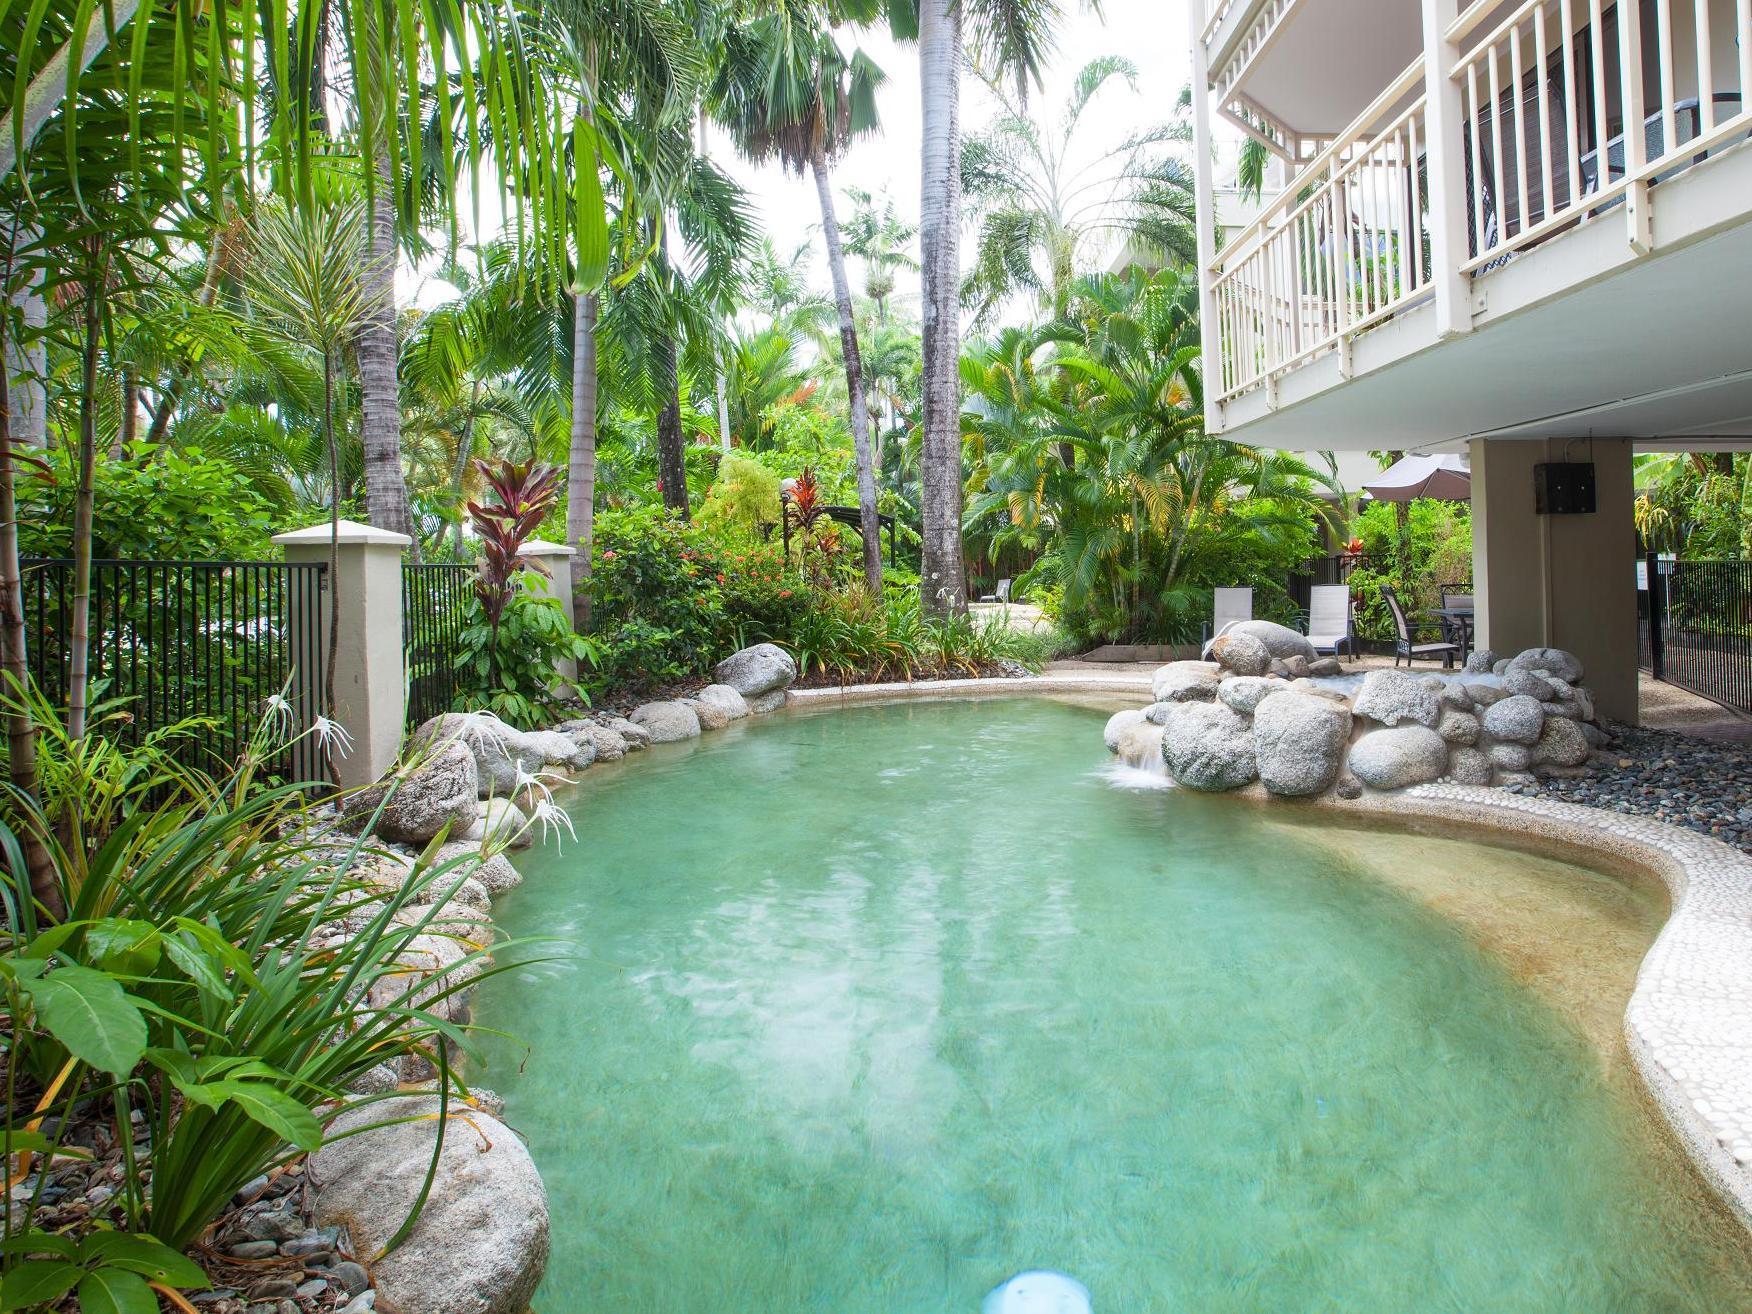 Seascape Holidays - Driftwood Mantaray Apartment 4 - Hotell och Boende i Australien , Port Douglas